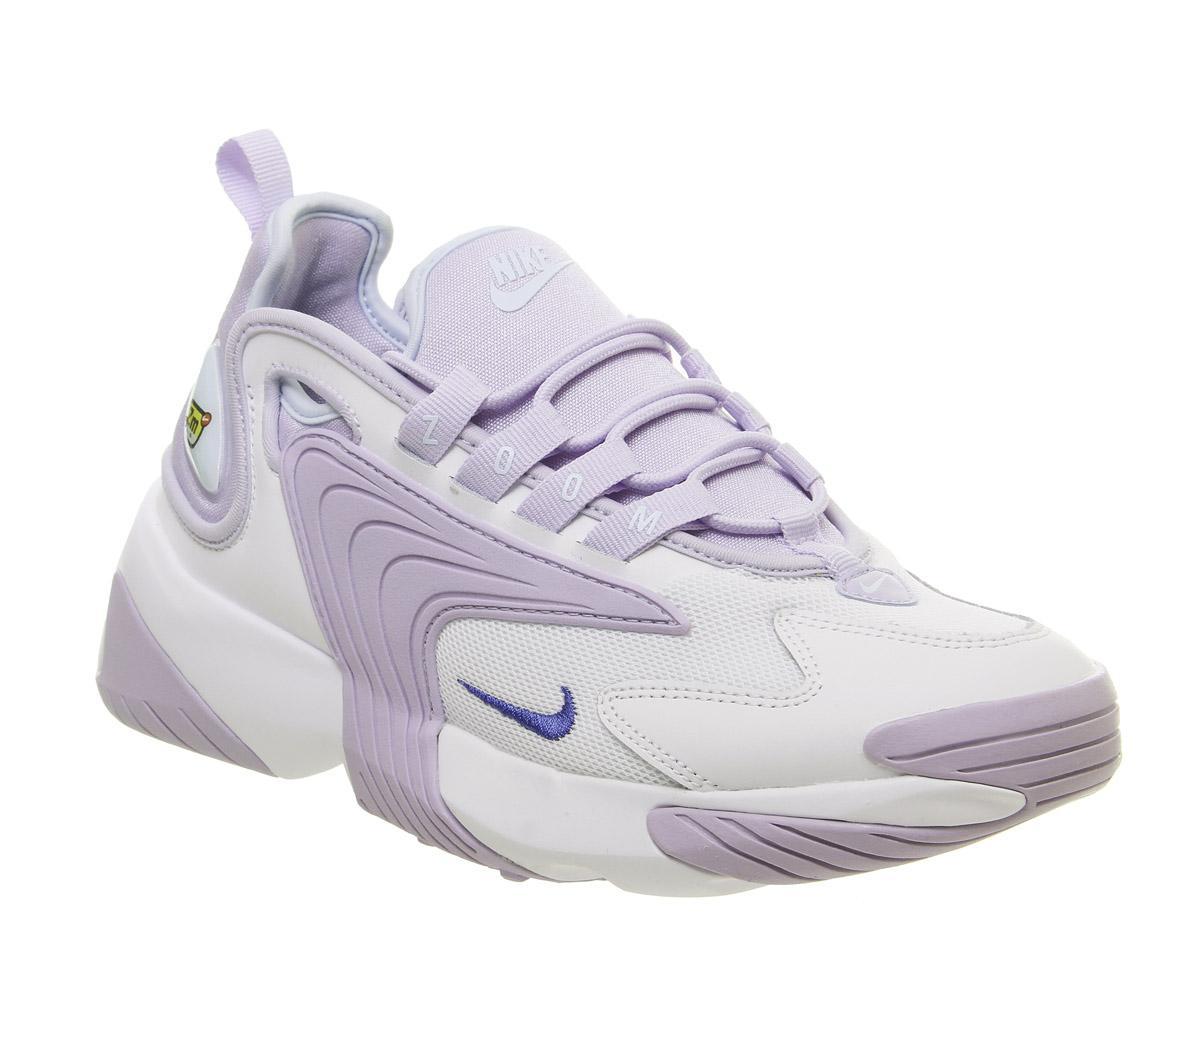 Nike Zoom 2k Trainers White Sapphire